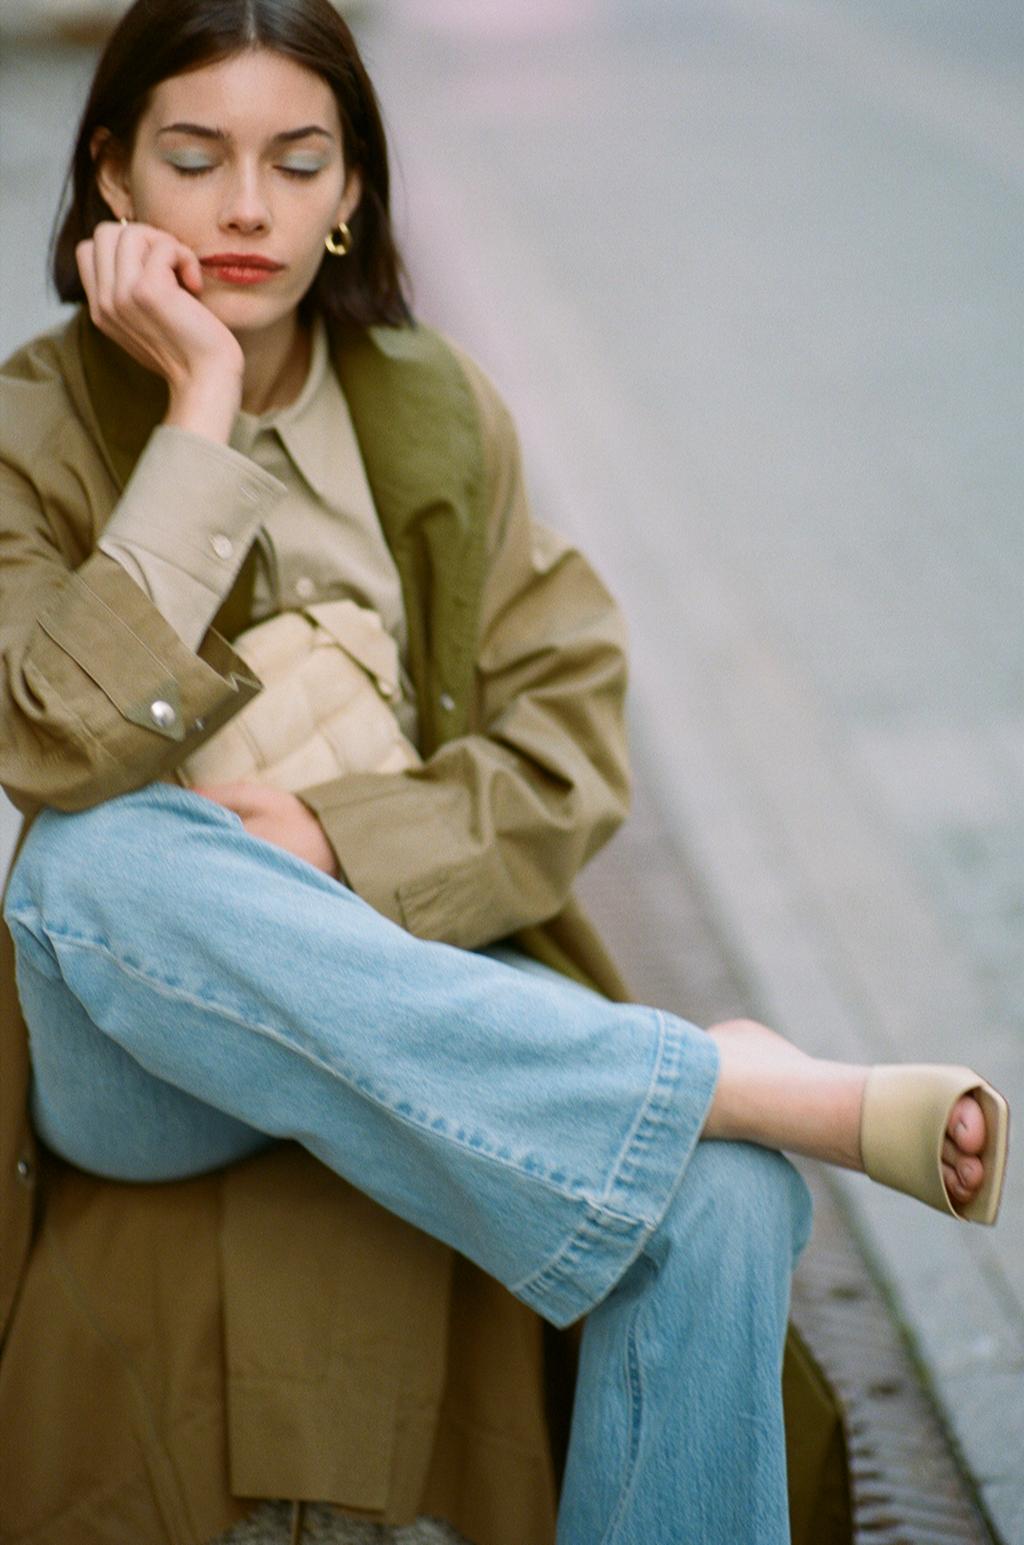 Хлопковый тренч Isabel Marant Etoile; джинсы Stella McCartney; рубашка, мюли, сумка— все Bottega Veneta